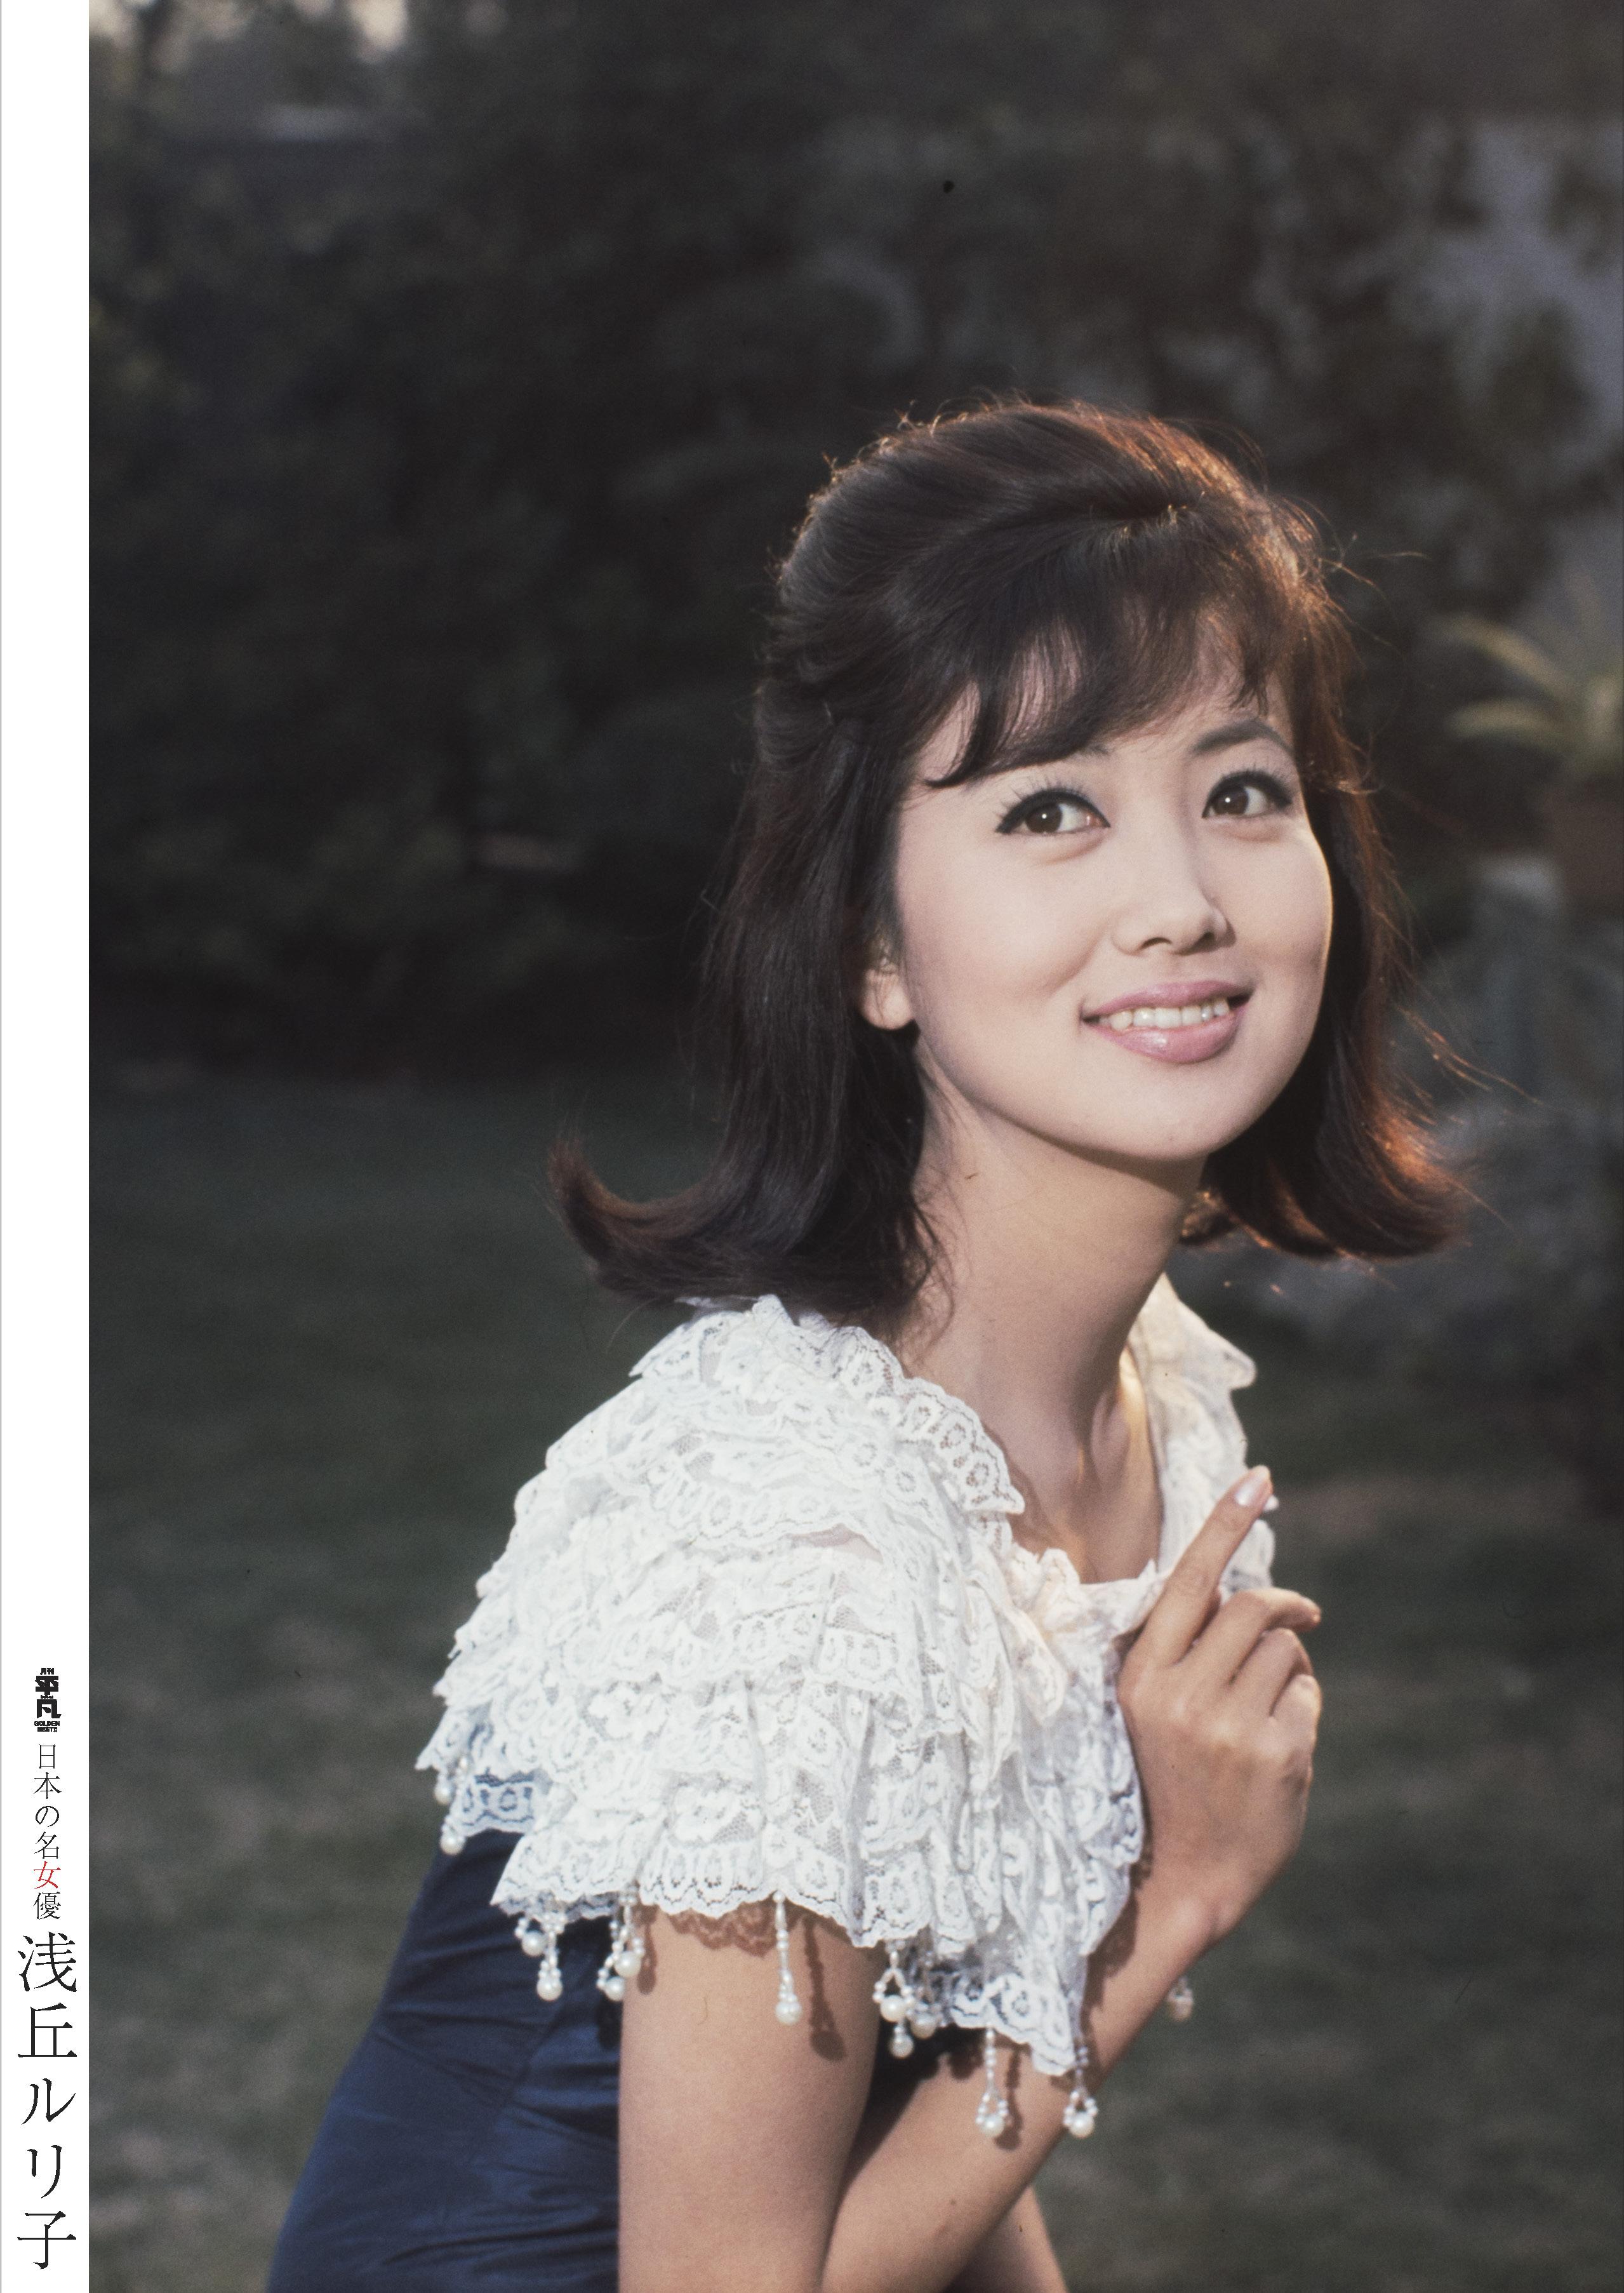 平凡 日本の名女優 浅丘ルリ子